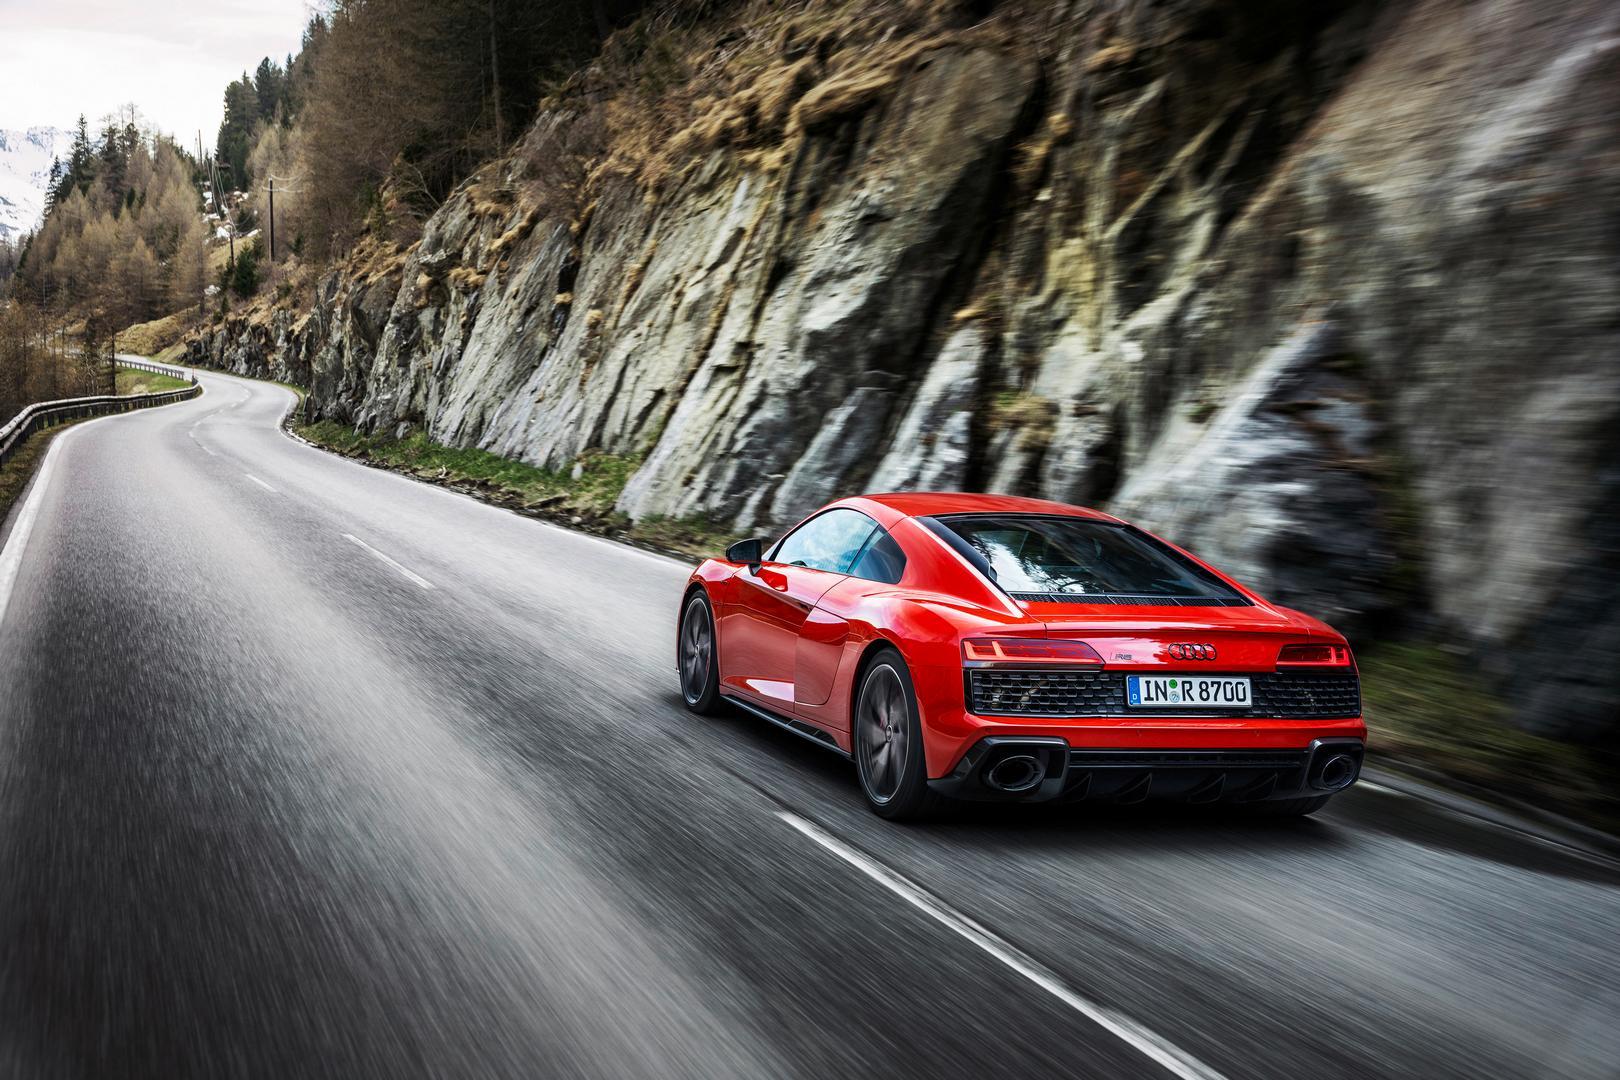 Audi R8 Coupé V10 performance